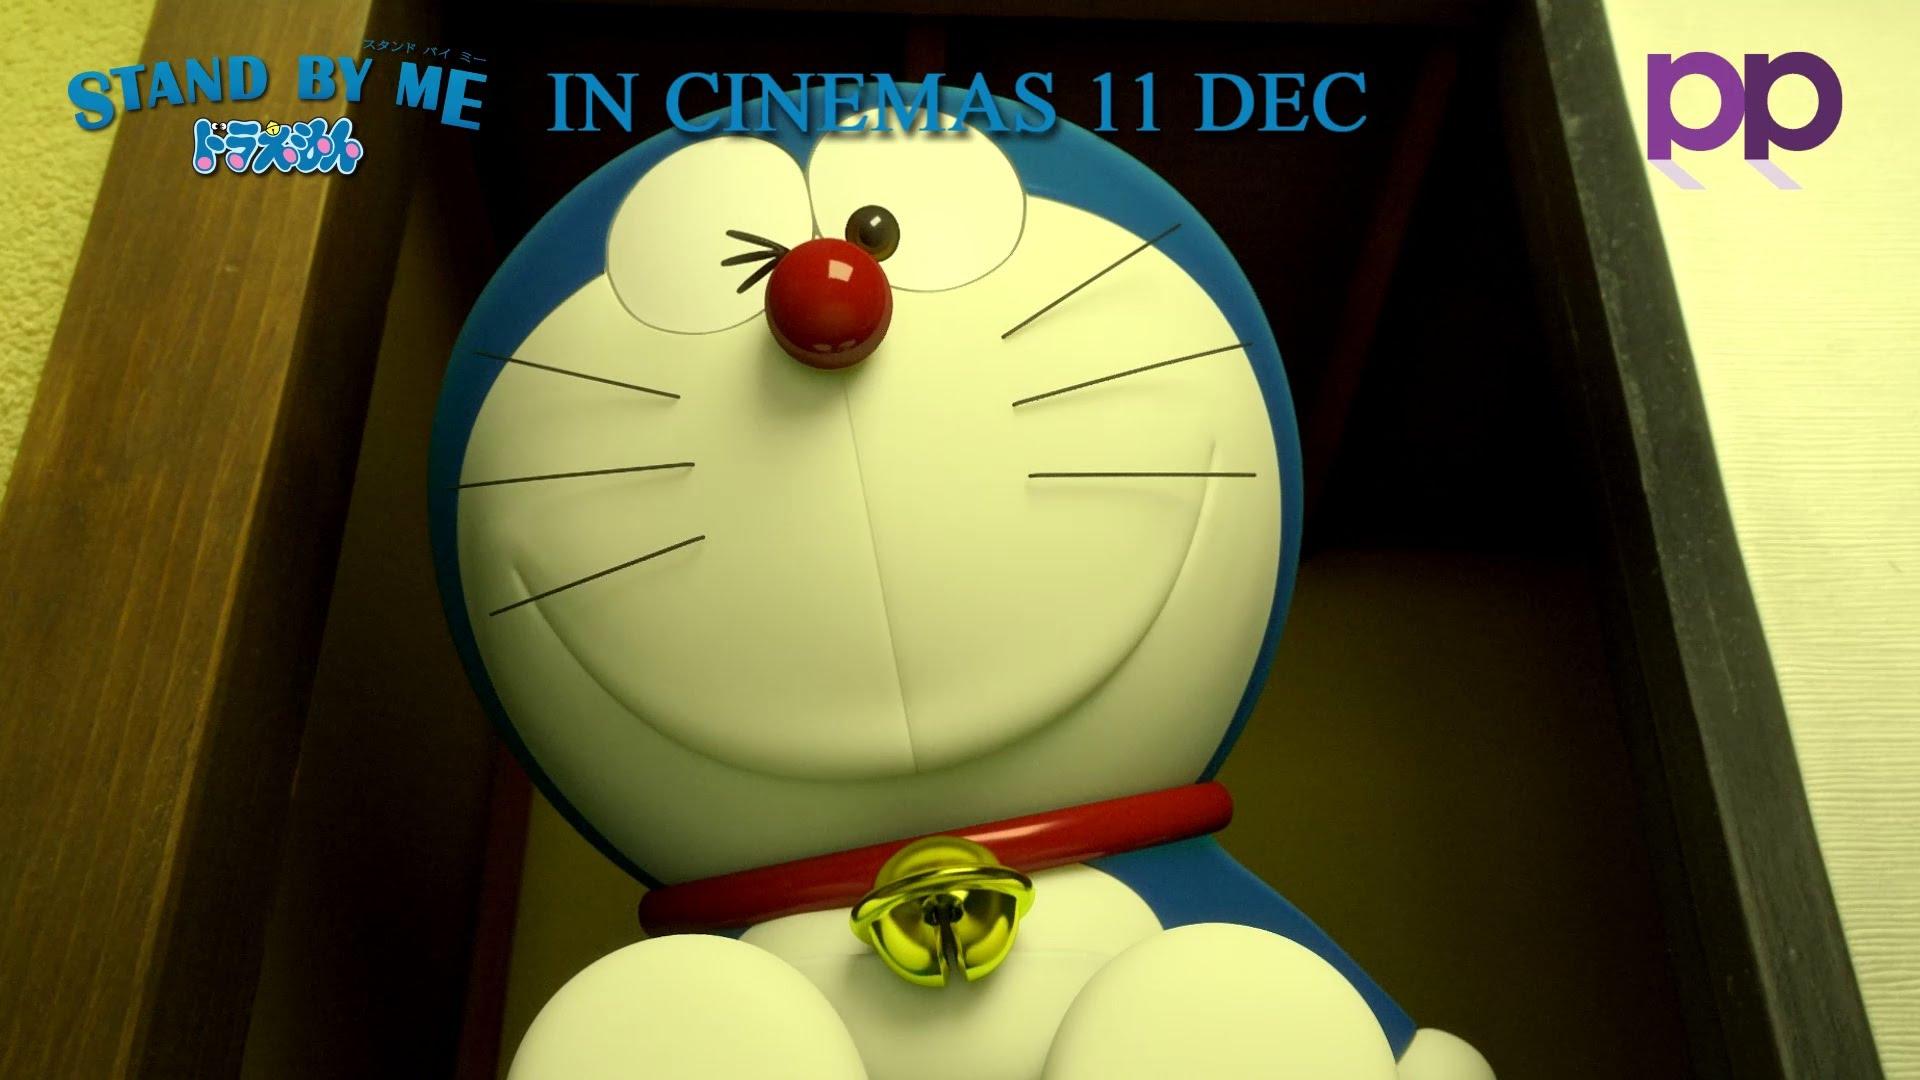 Wallpaper Doraemon Stand By Me วอลเปเปอร์ โด เร ม่อน 3